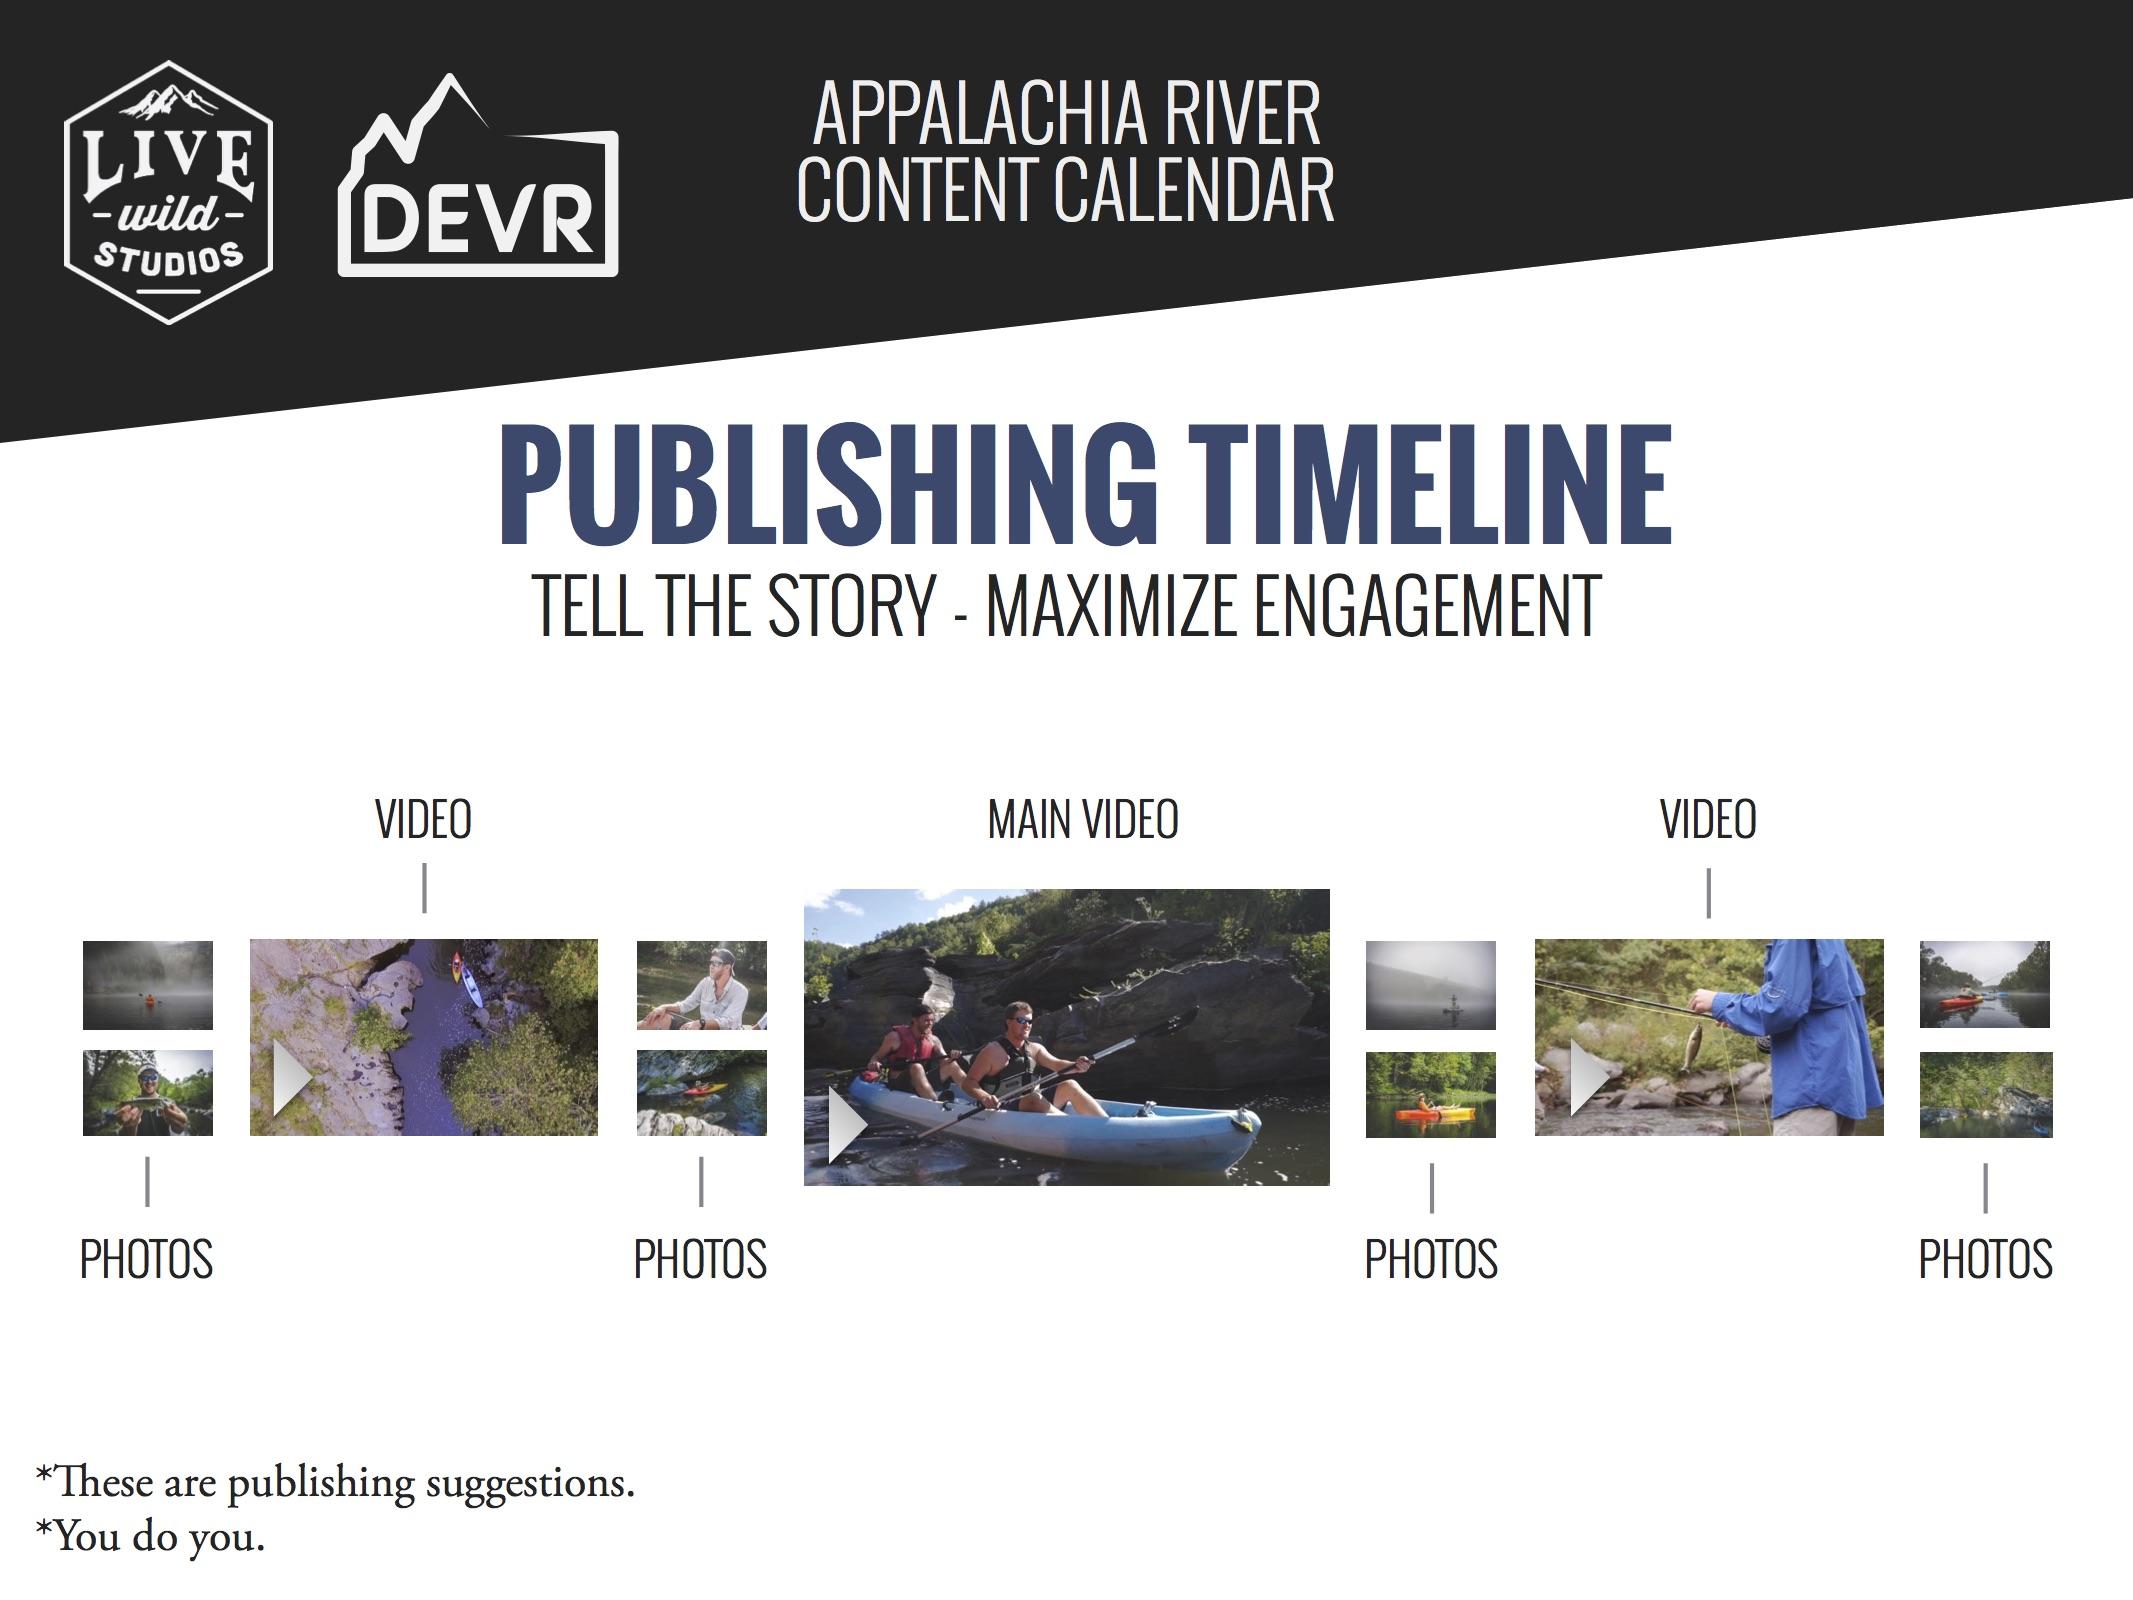 Appalachia River Adventure 2016 Campaign Guide 3.jpg